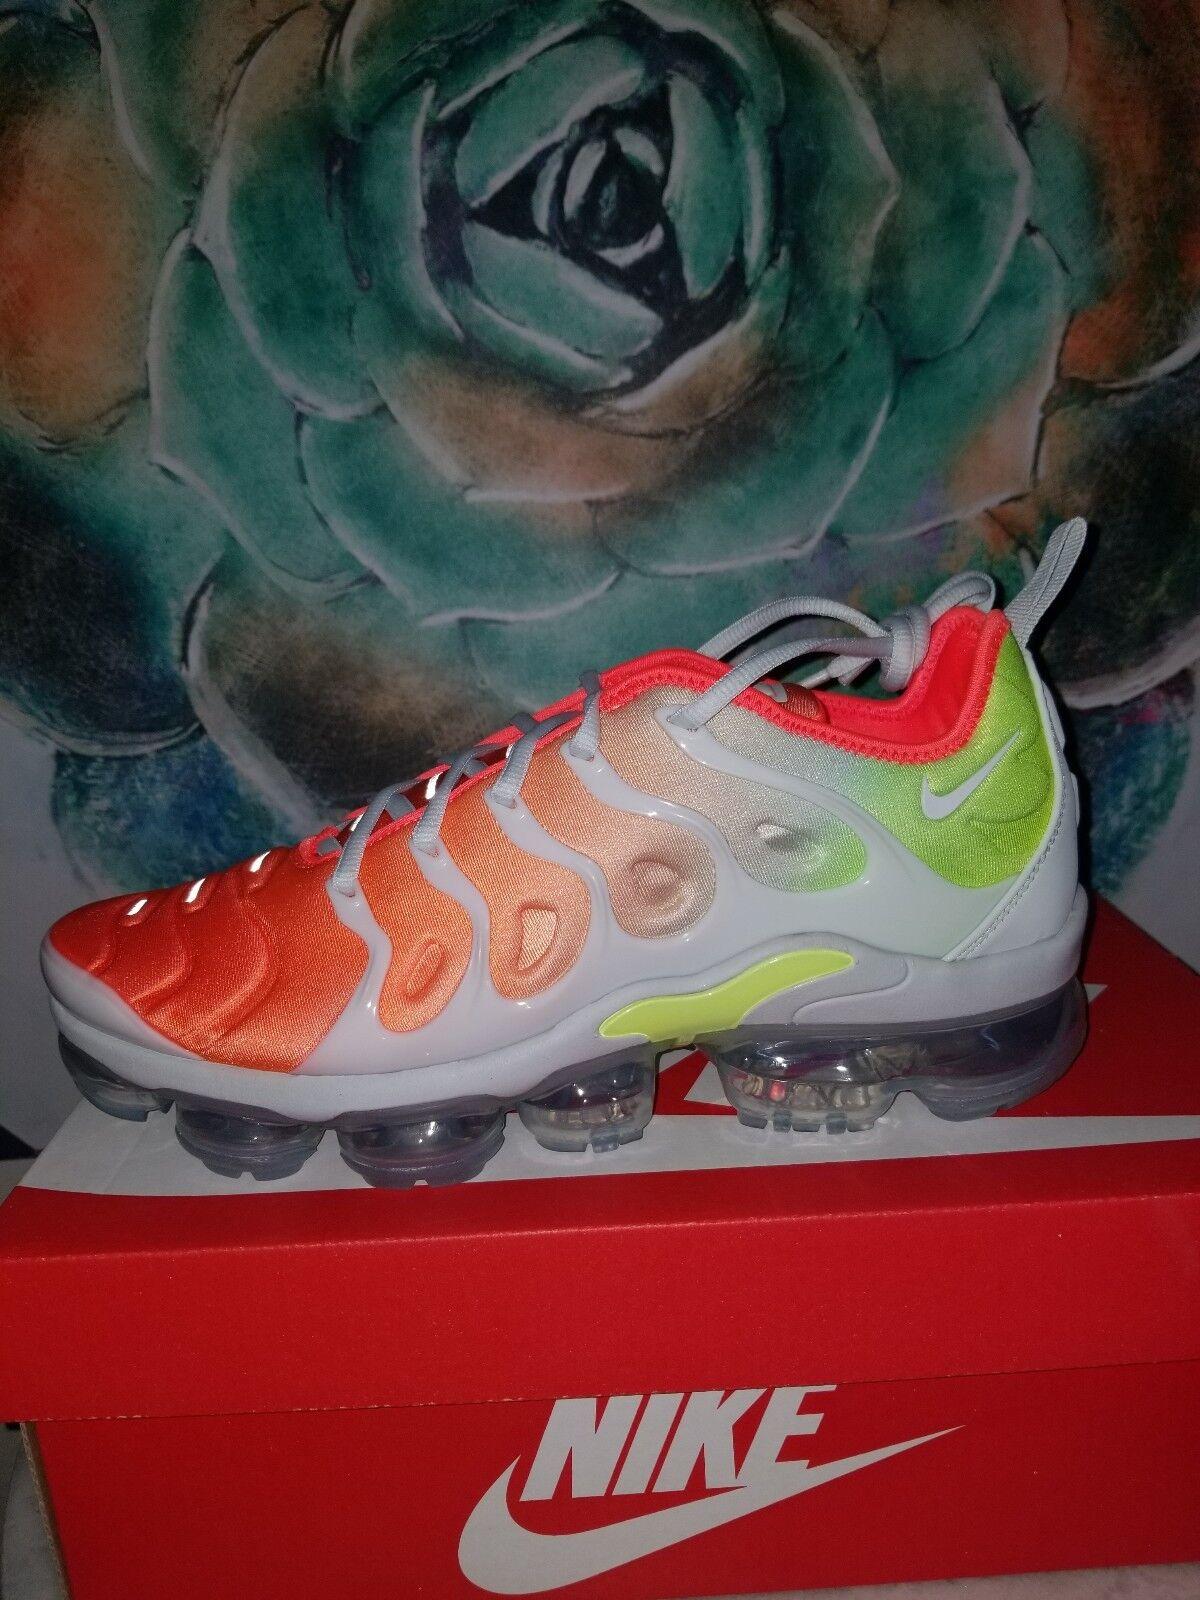 Nike air vapormax piu 'a malapena grey invertire w crimson taglia 10 volt neon sunset